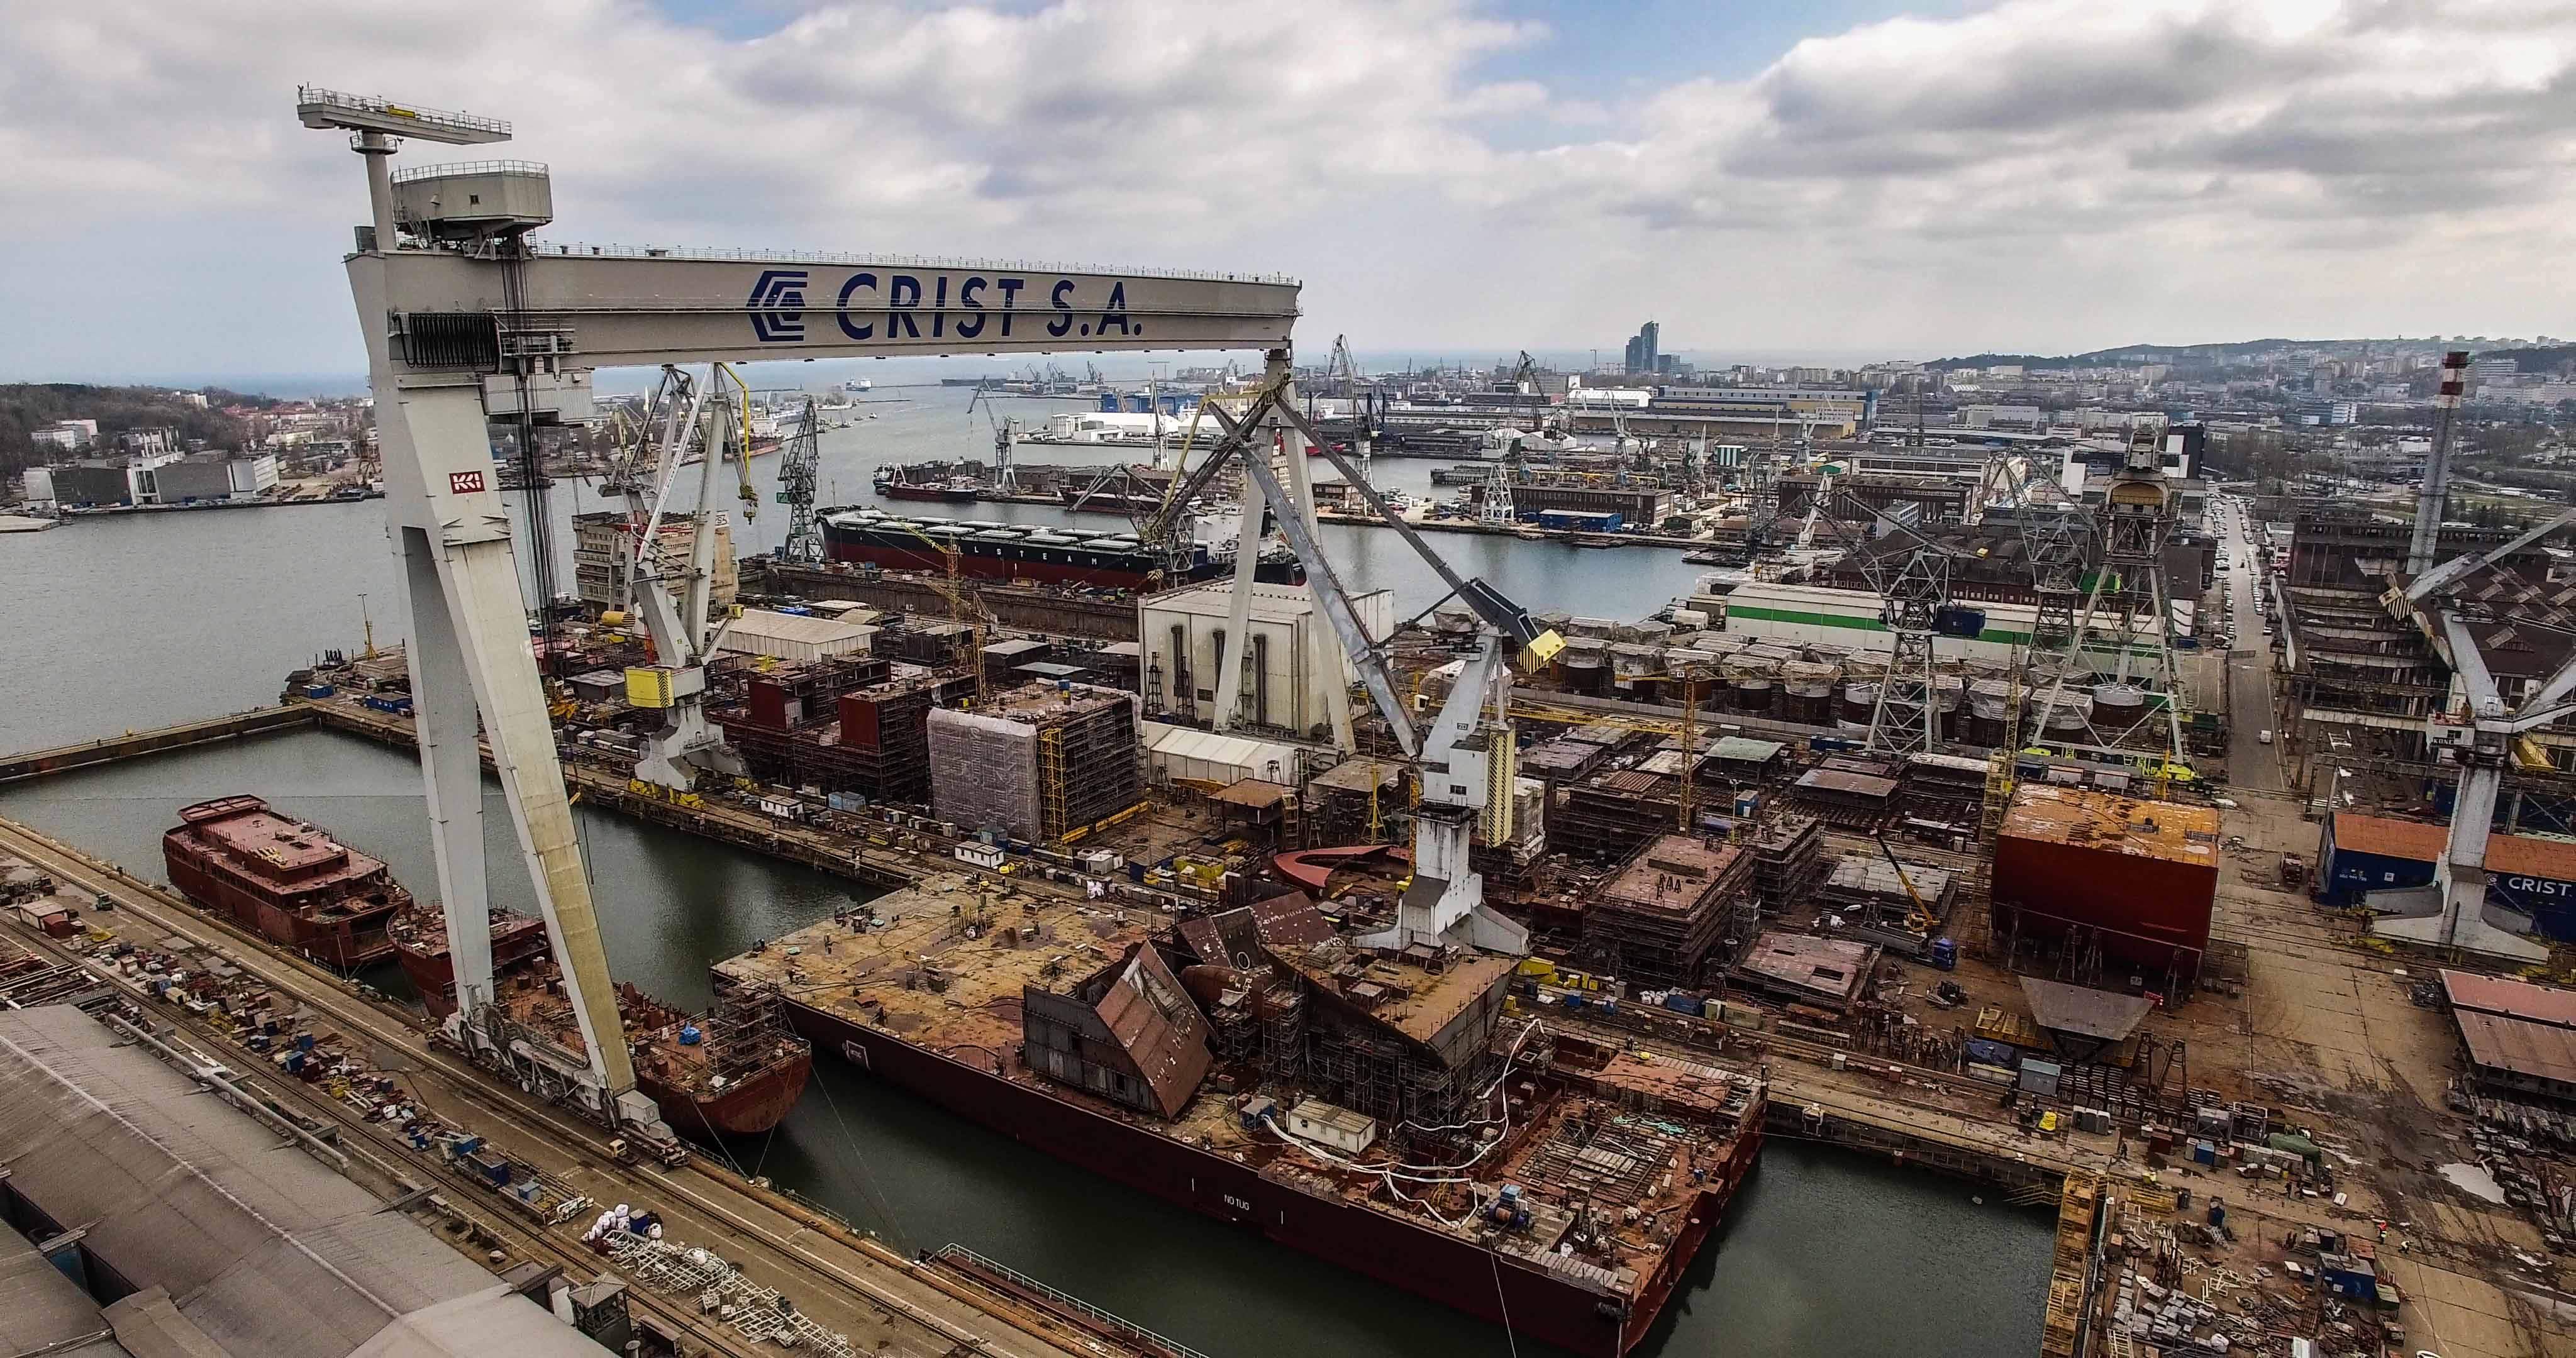 Megablock for passenger ship left Crist shipyard [foto, video]